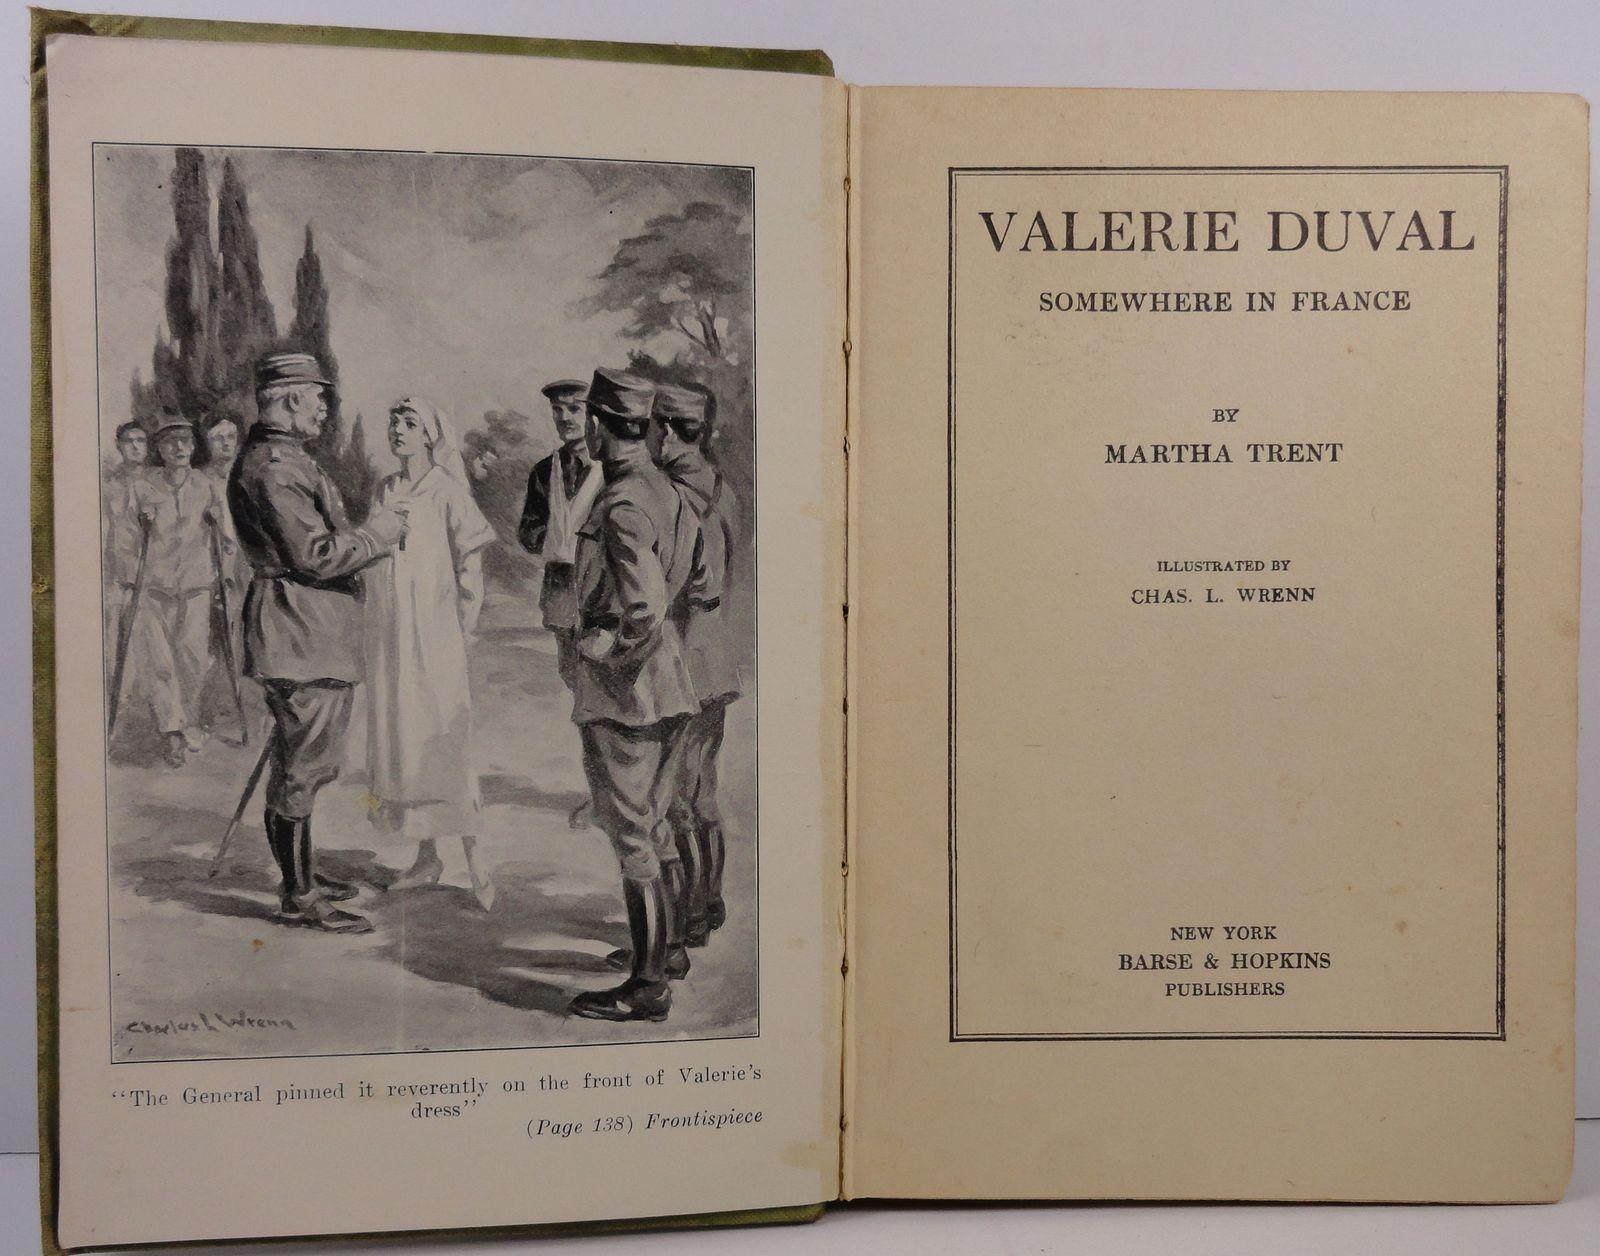 Valerie Duval Somewhere in France by Martha Trent 1918